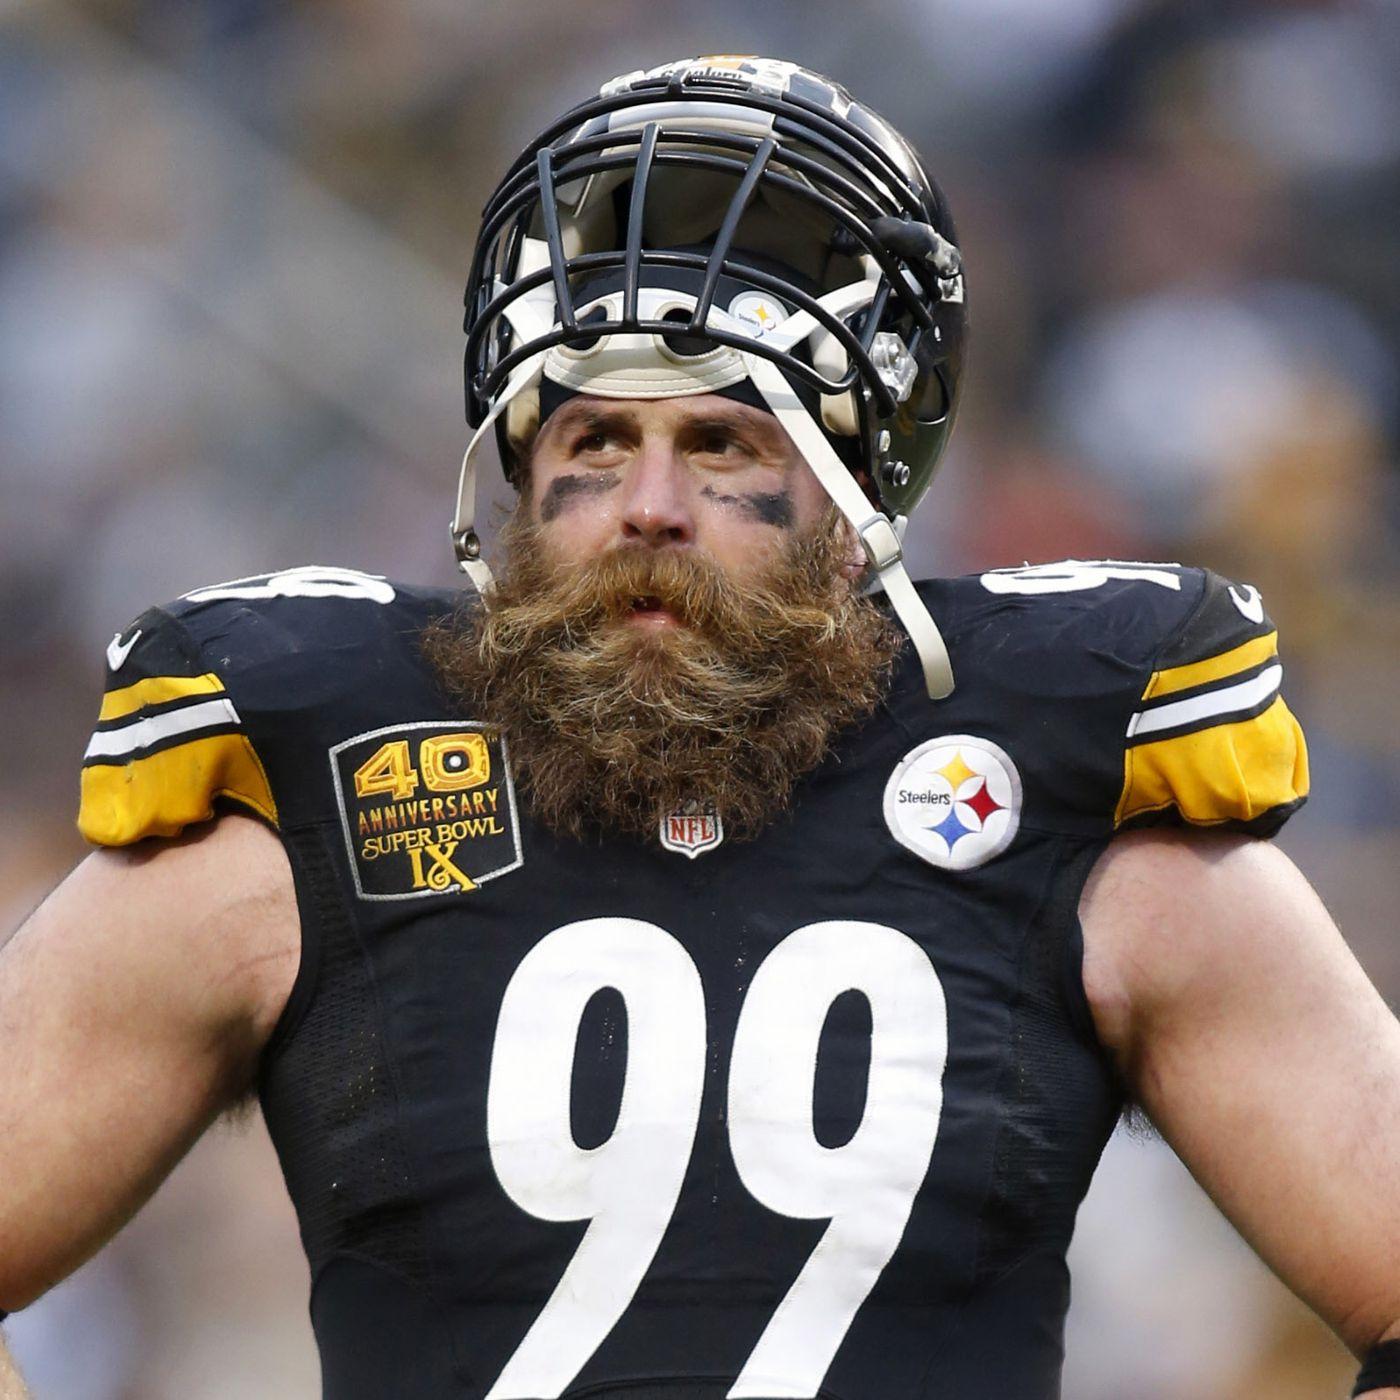 2015 Steelers season scenarios: Brett Keisel returns...again ...